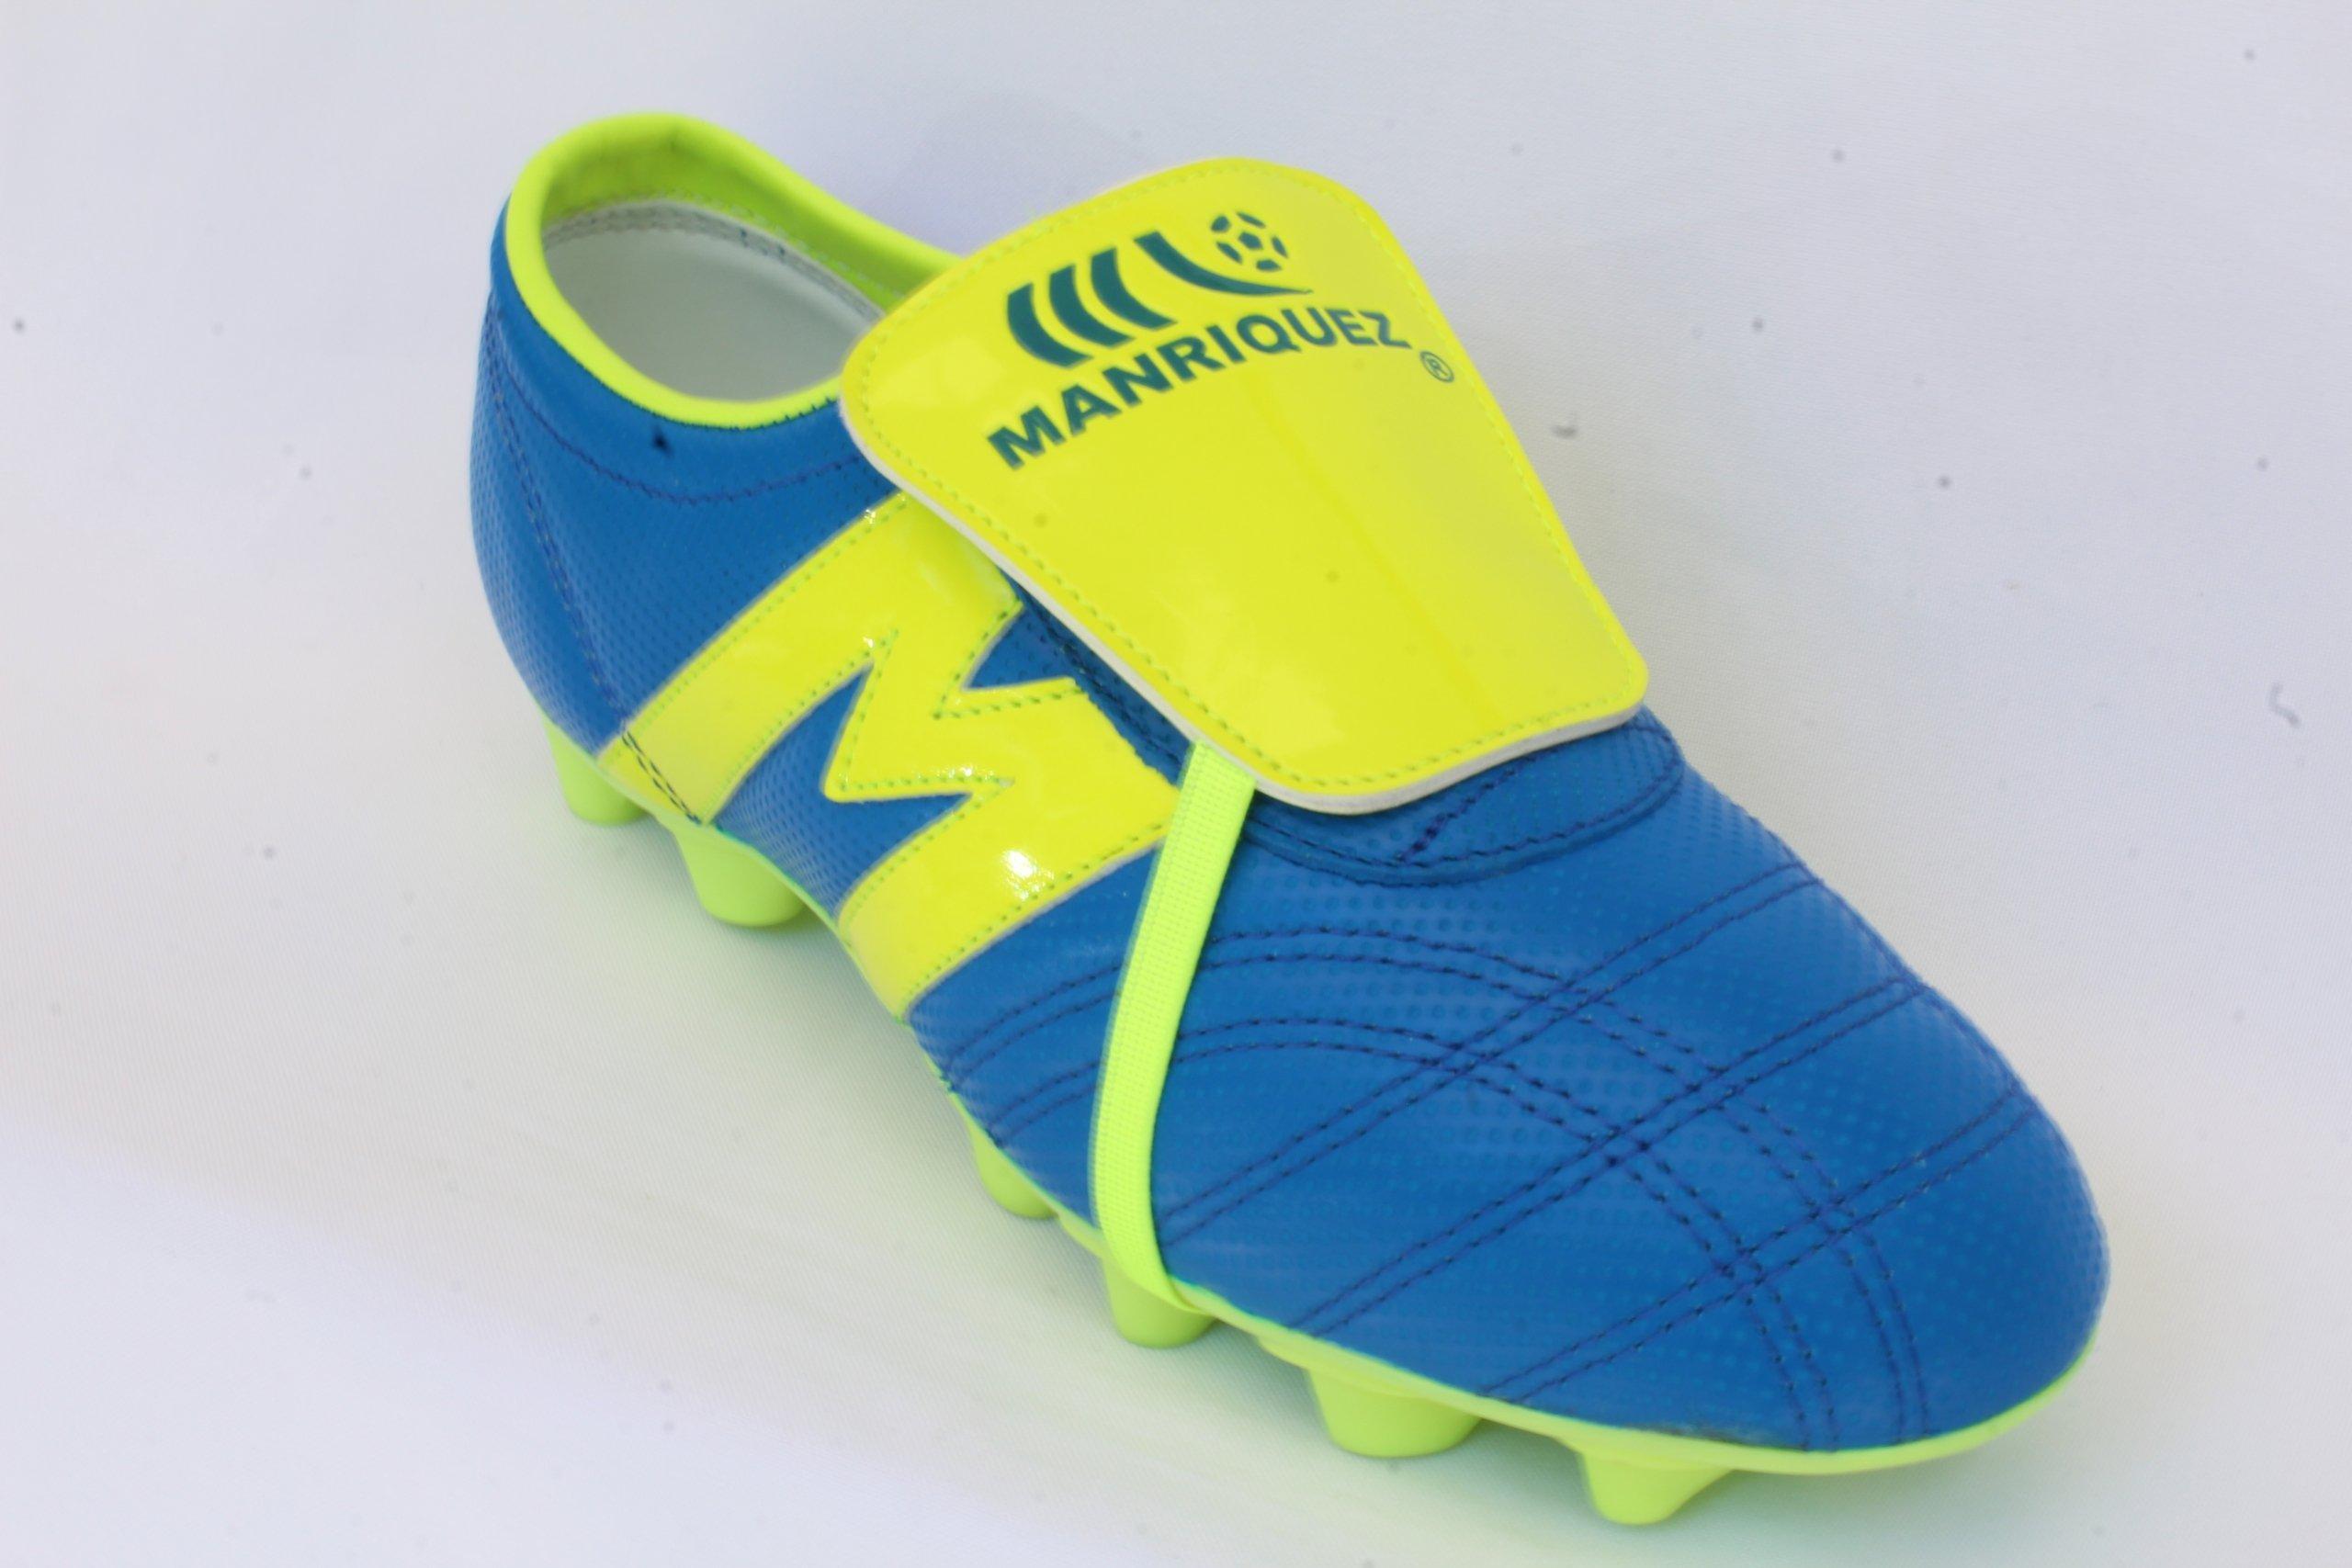 2232B-Zapato de Futbol Manriquez MID SX AZUL/VERDE